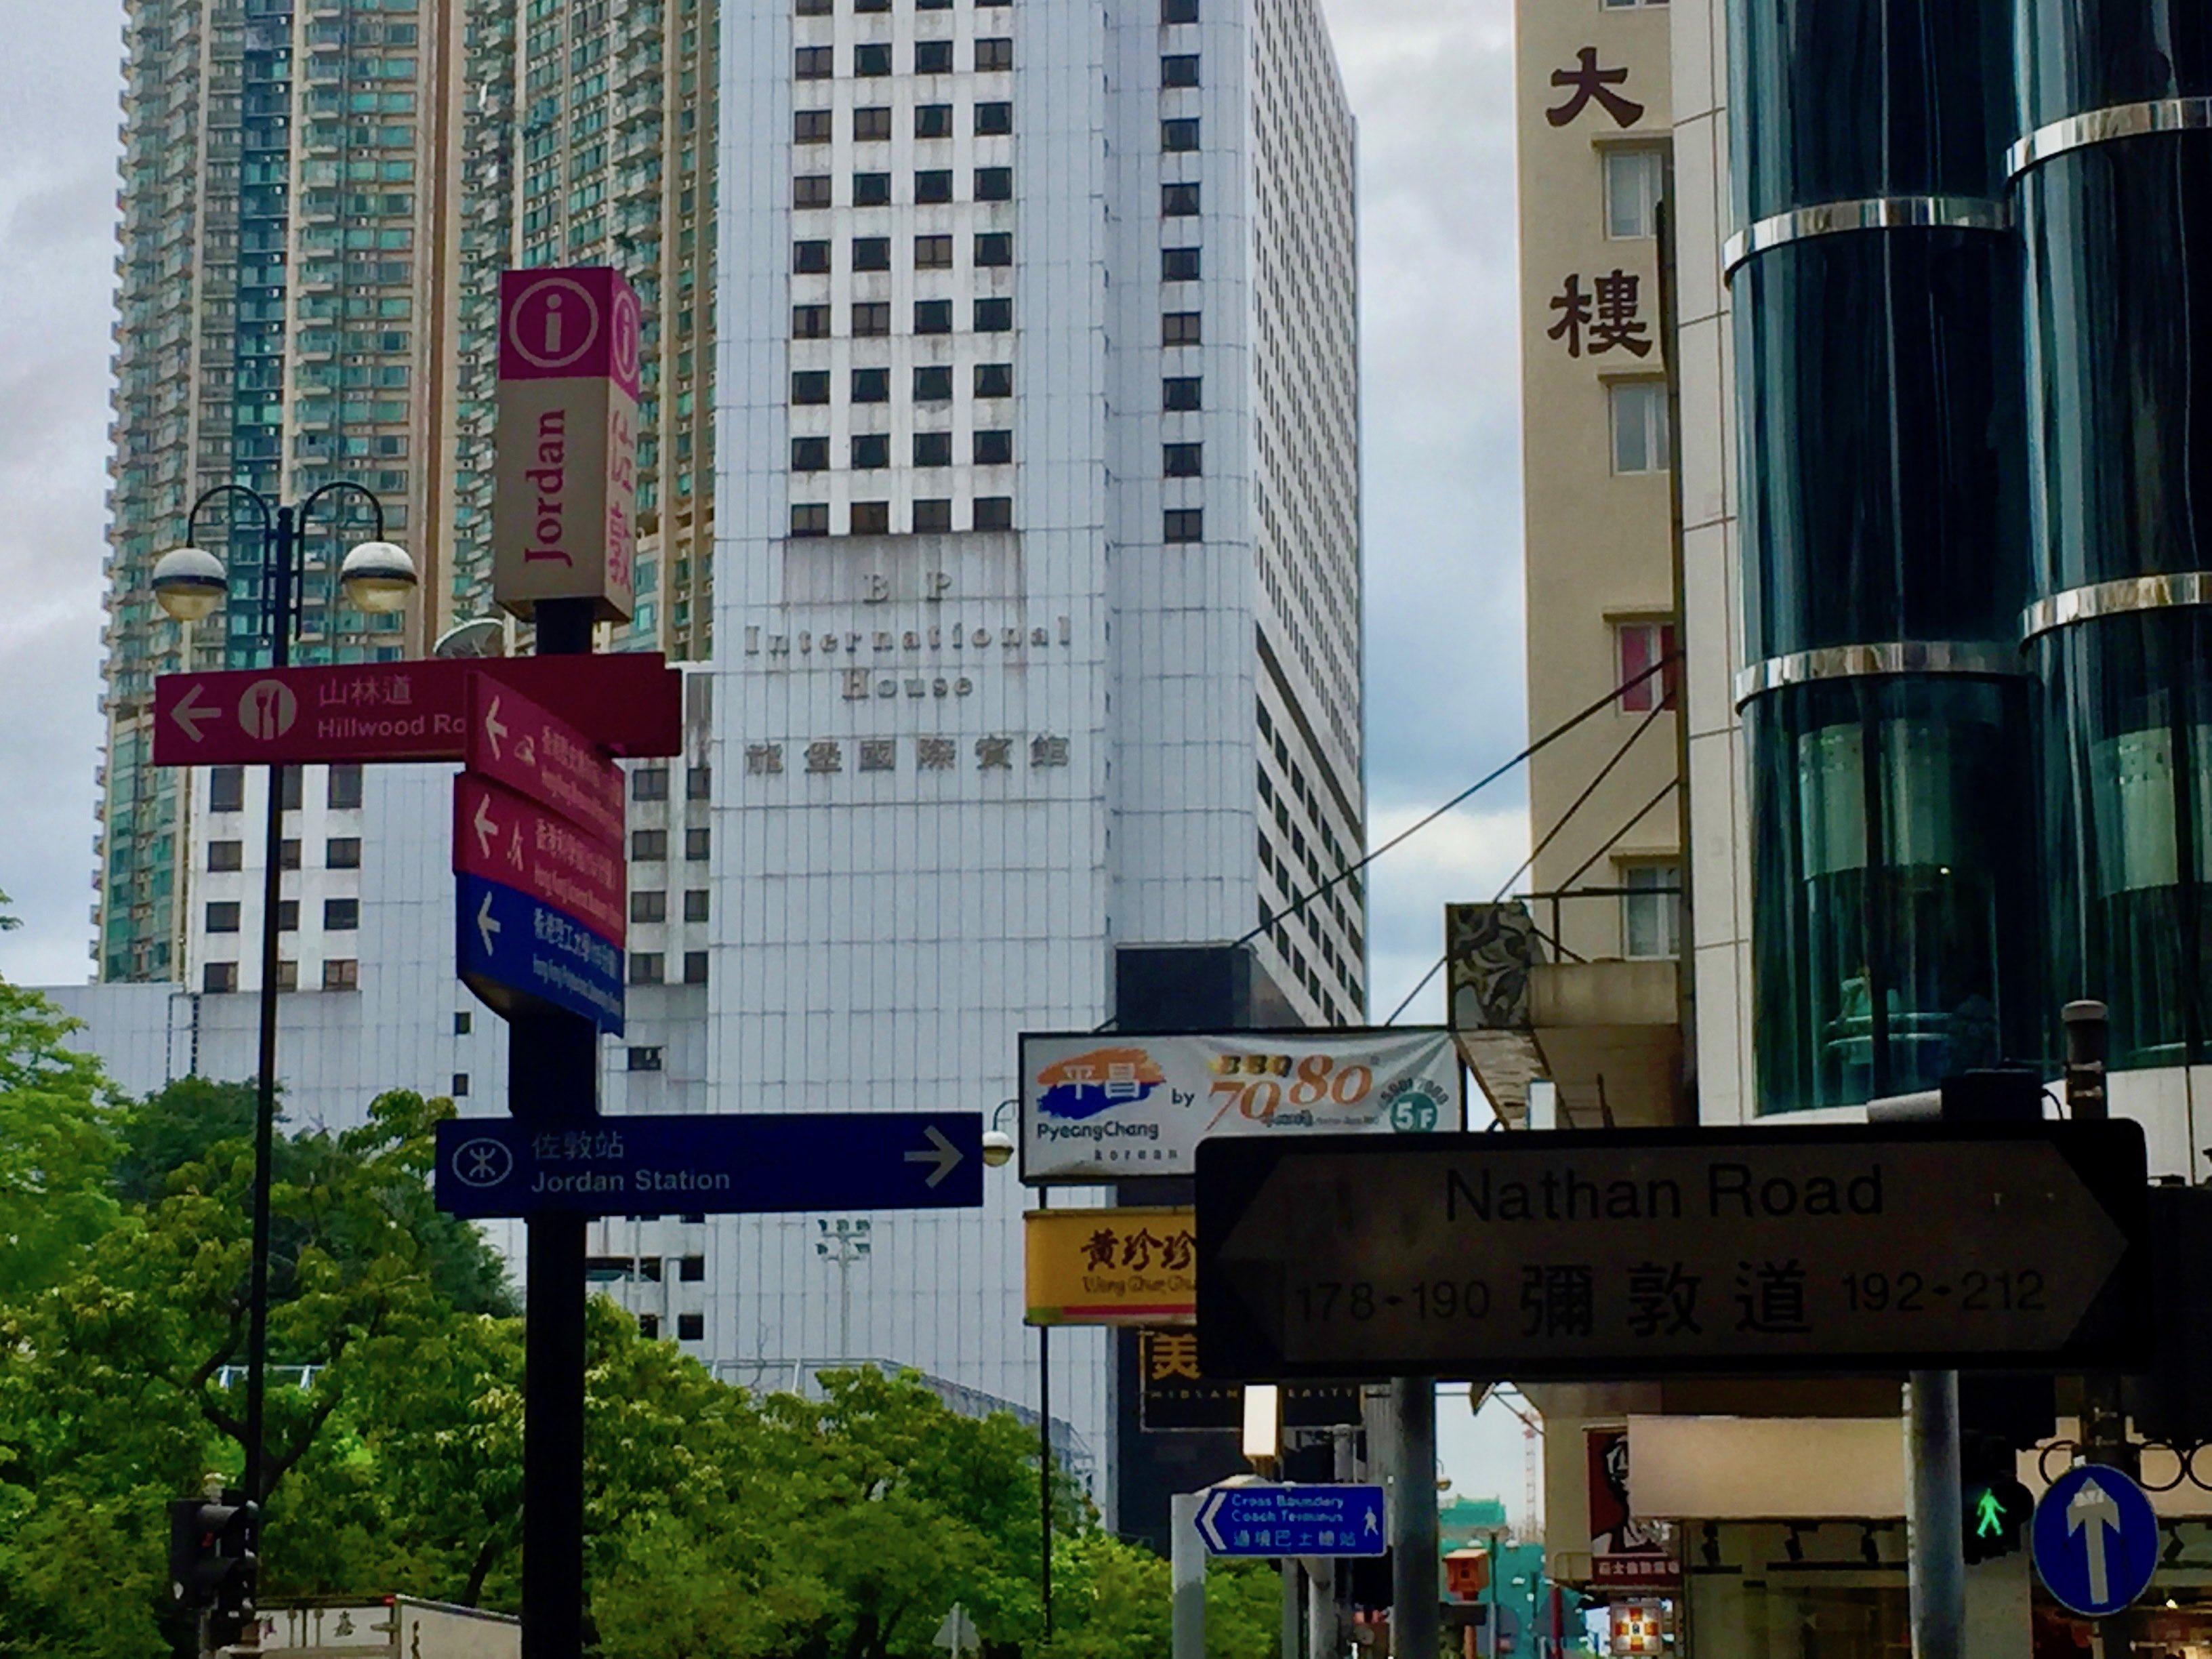 Tsim Sha Tsui Hillwood Road G/F FB space for lease - HK